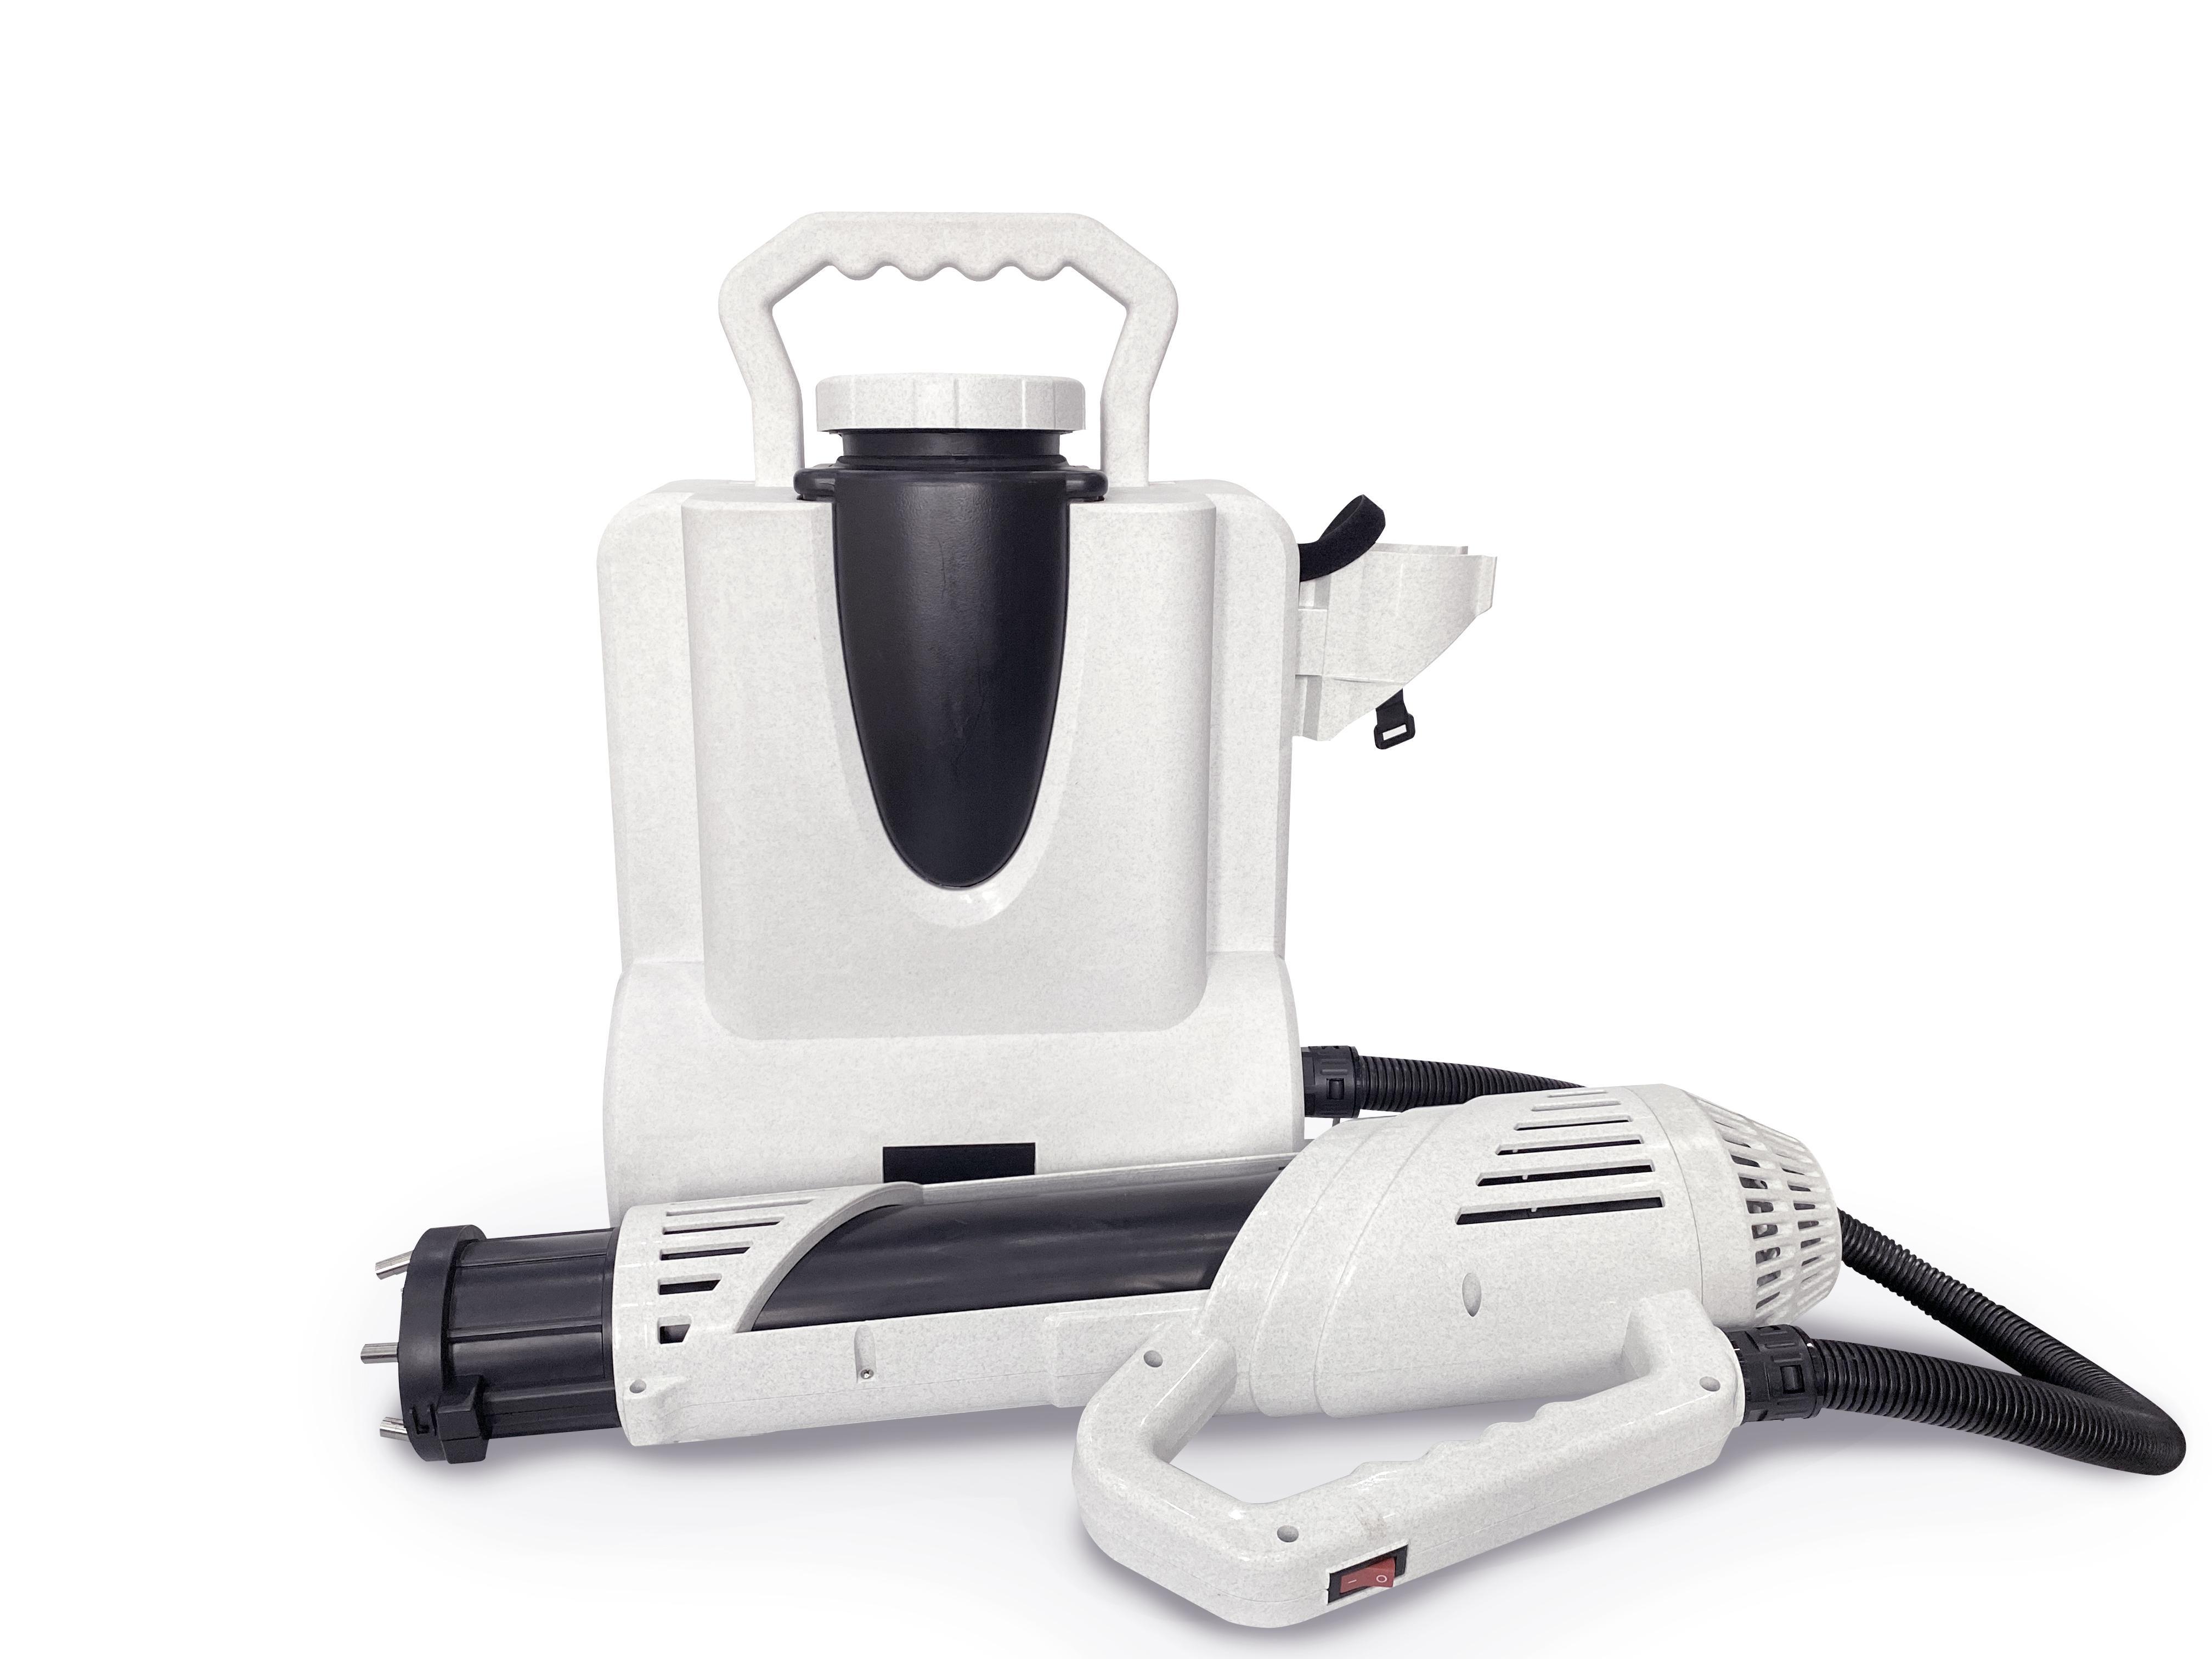 Electrostatic Sprayer Watering Can Garden Hoses Fogger Sanitizer Gun 790 High End Cordless Backpack Battery Electrostatic Spray Gun